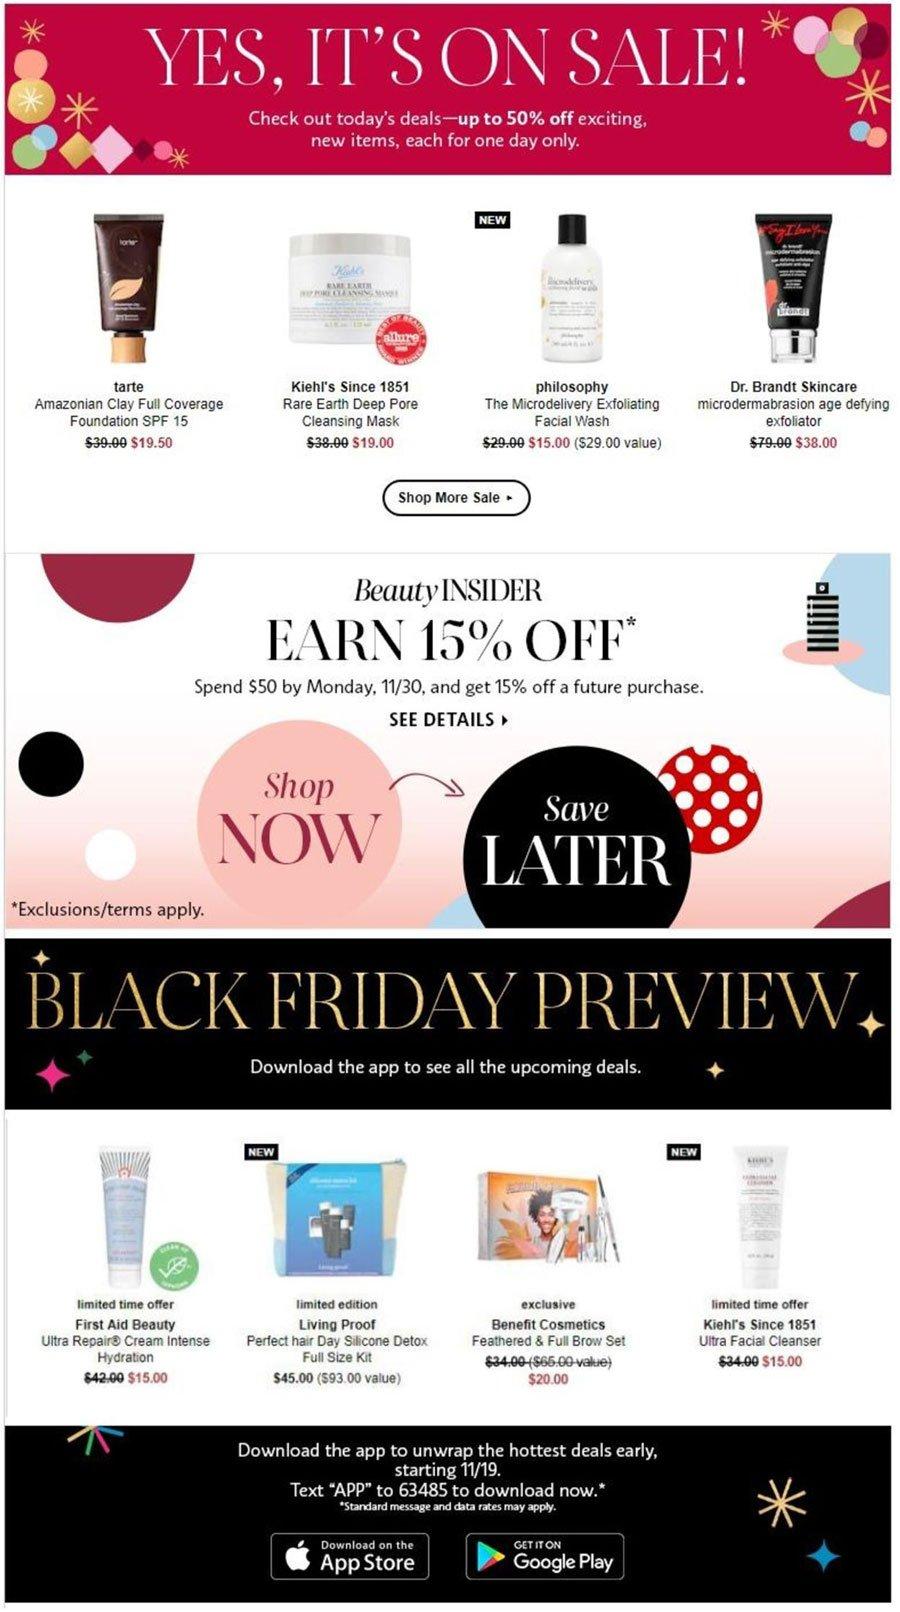 Sephora Black Friday 2020 Page 2